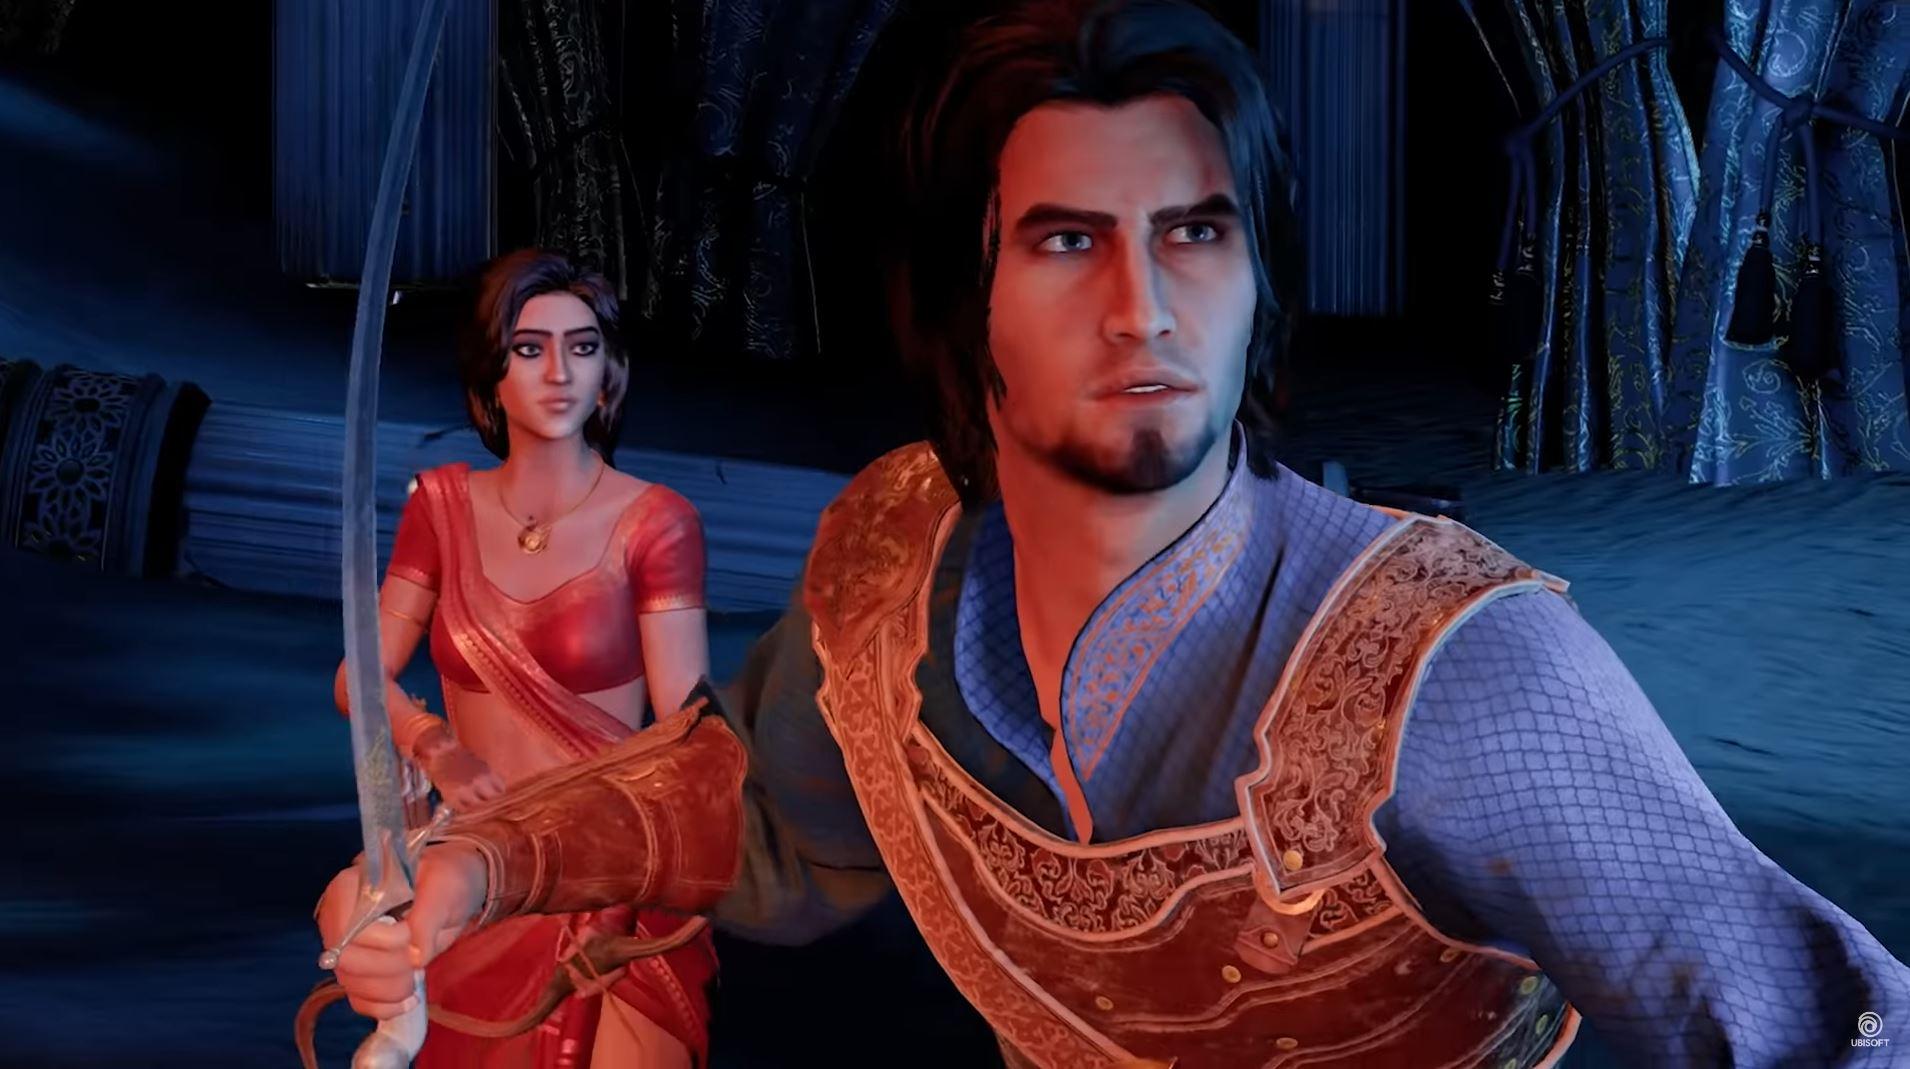 Prince of Persia 622021 2